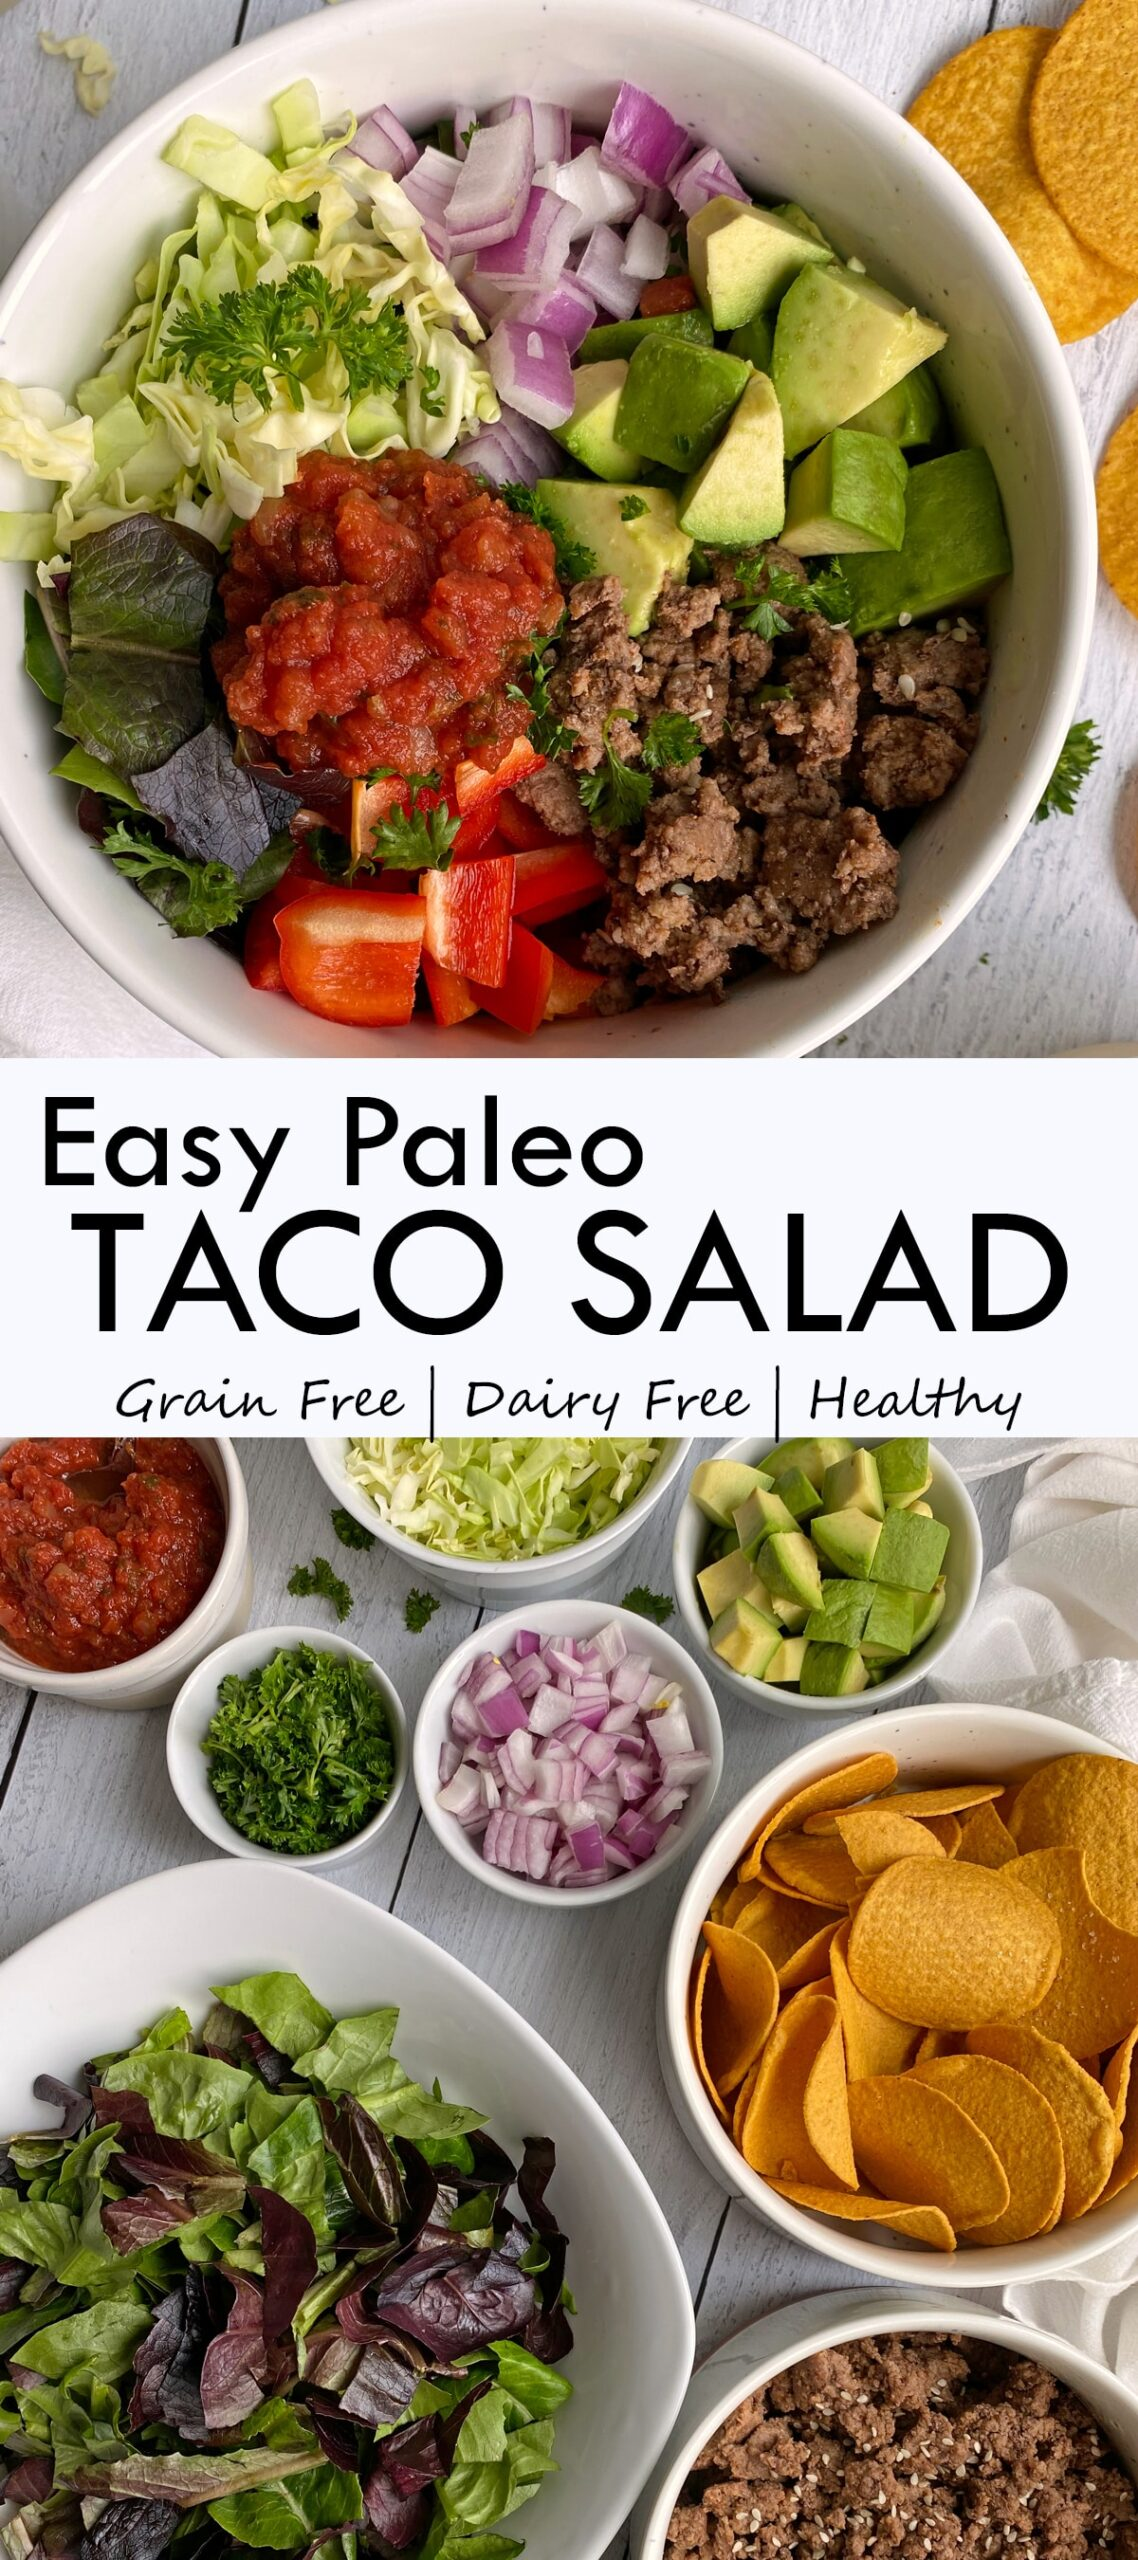 easy-paleo-taco-salad-recipe-pinterest-image